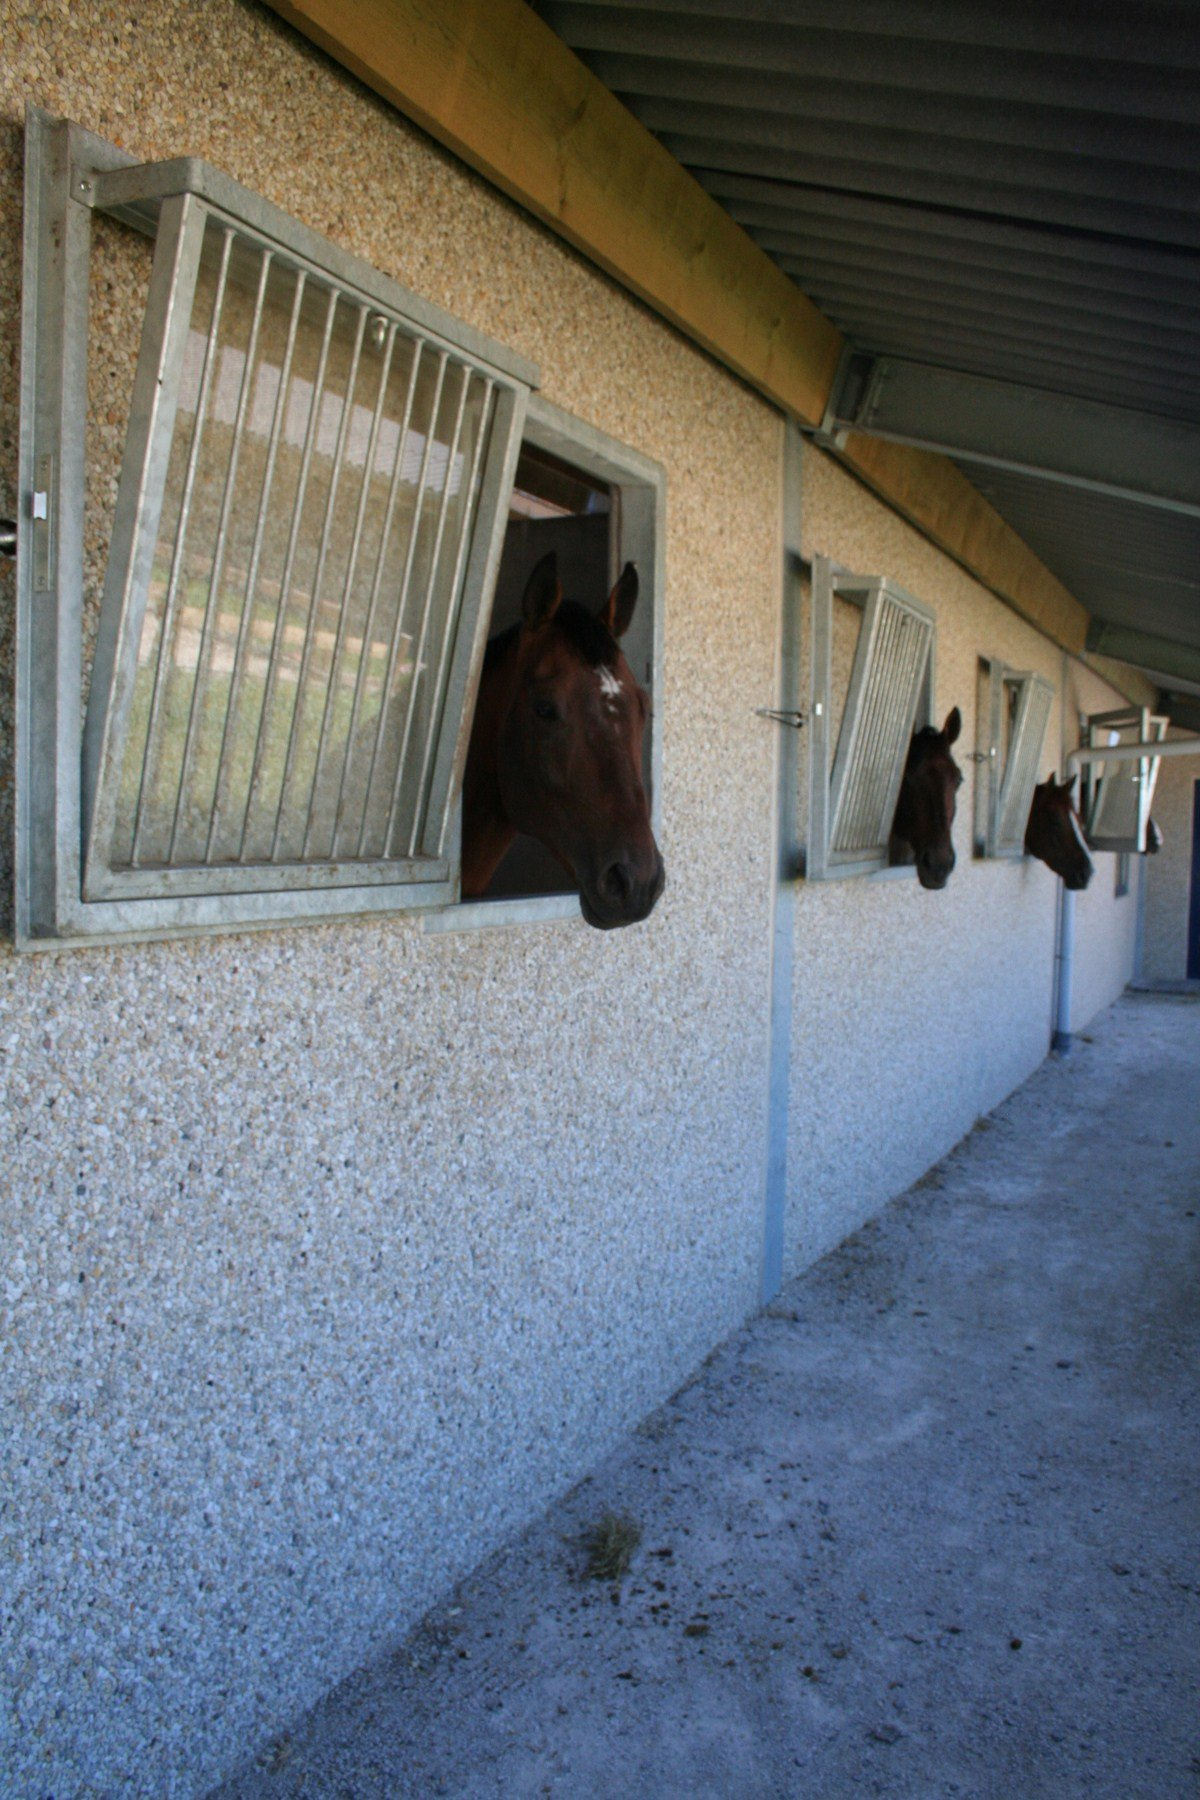 saint hermelle_paardenstallen_paardenboxen_binnenpiste_gouy les Pieton (12).jpg